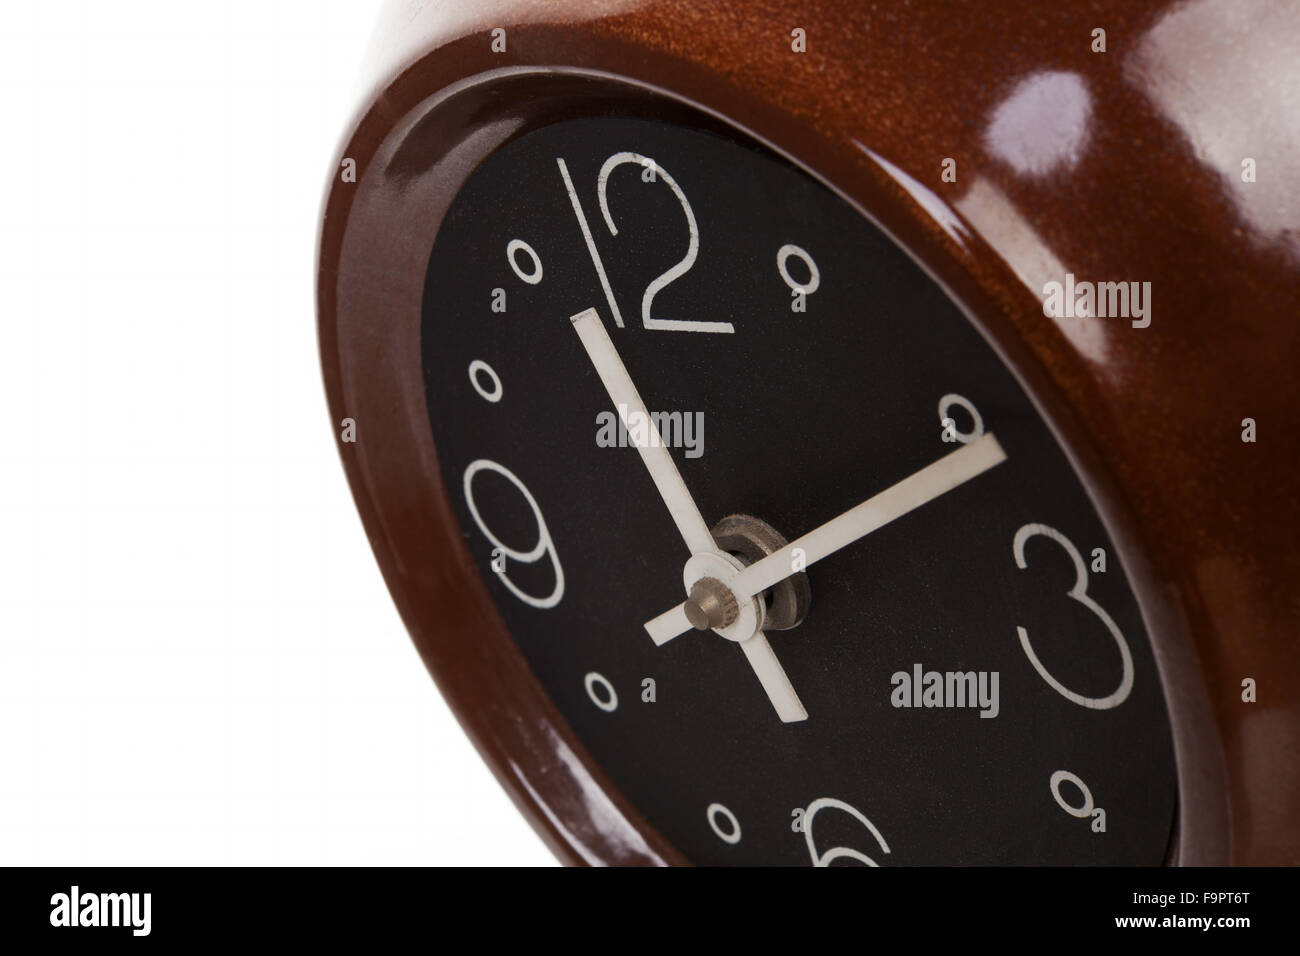 Retro clock from the sixties. - Stock Image